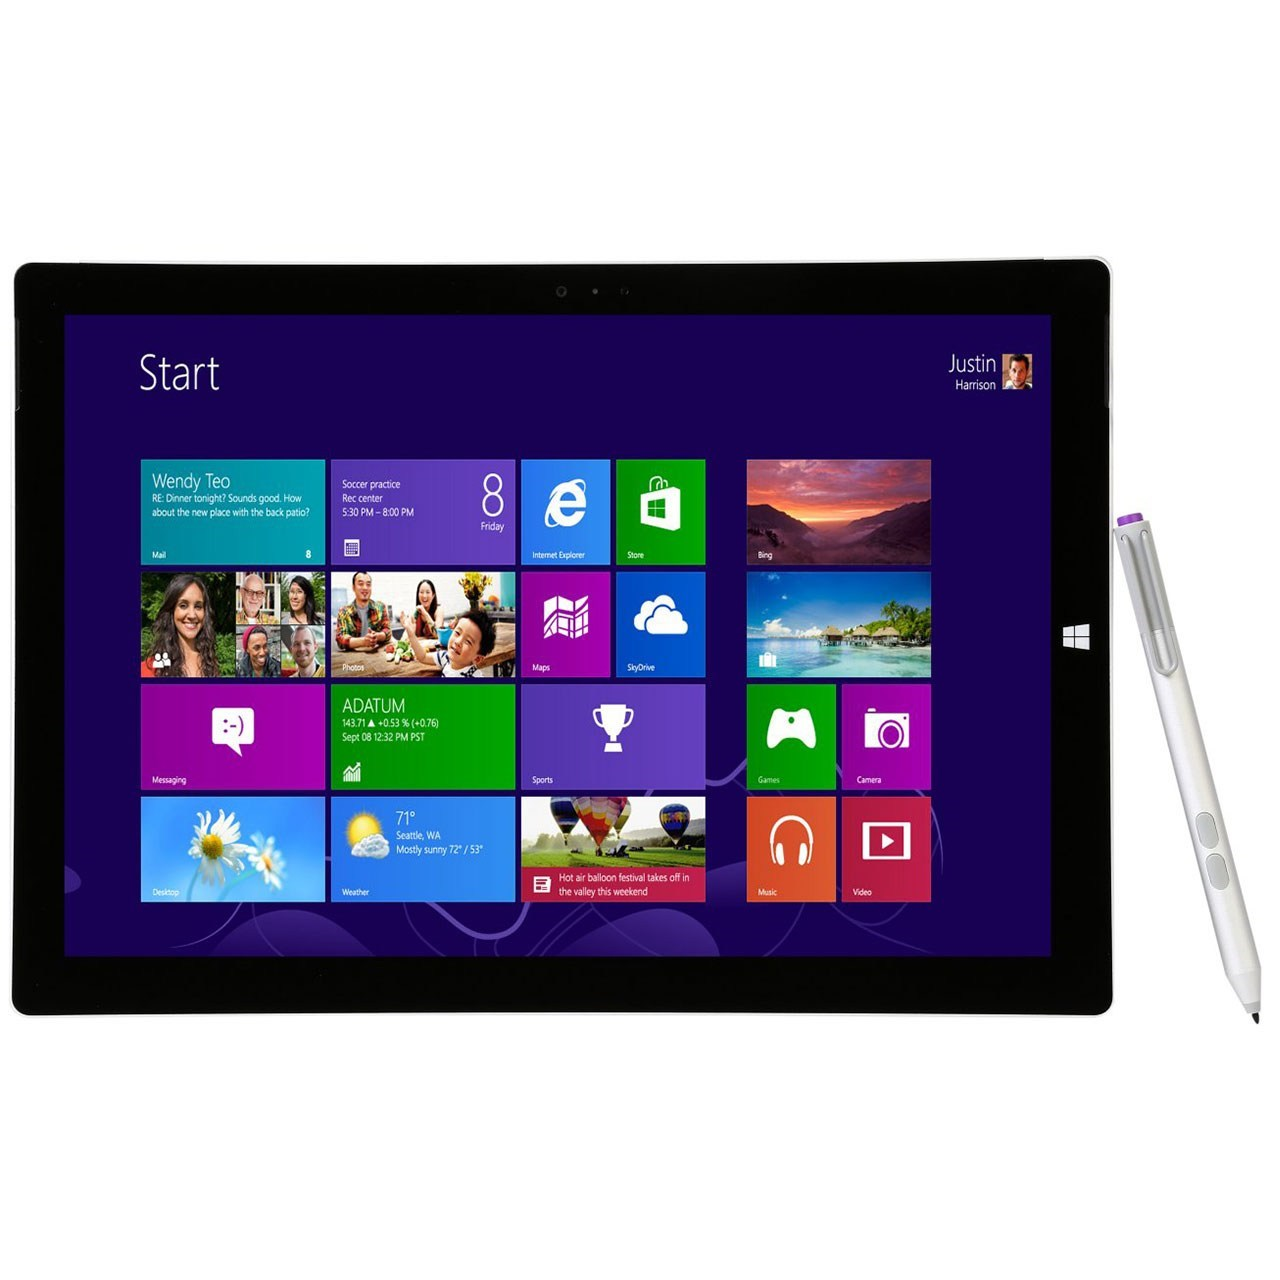 تبلت مايکروسافت مدل Surface Pro 3 - A ظرفيت 256 گيگابايت